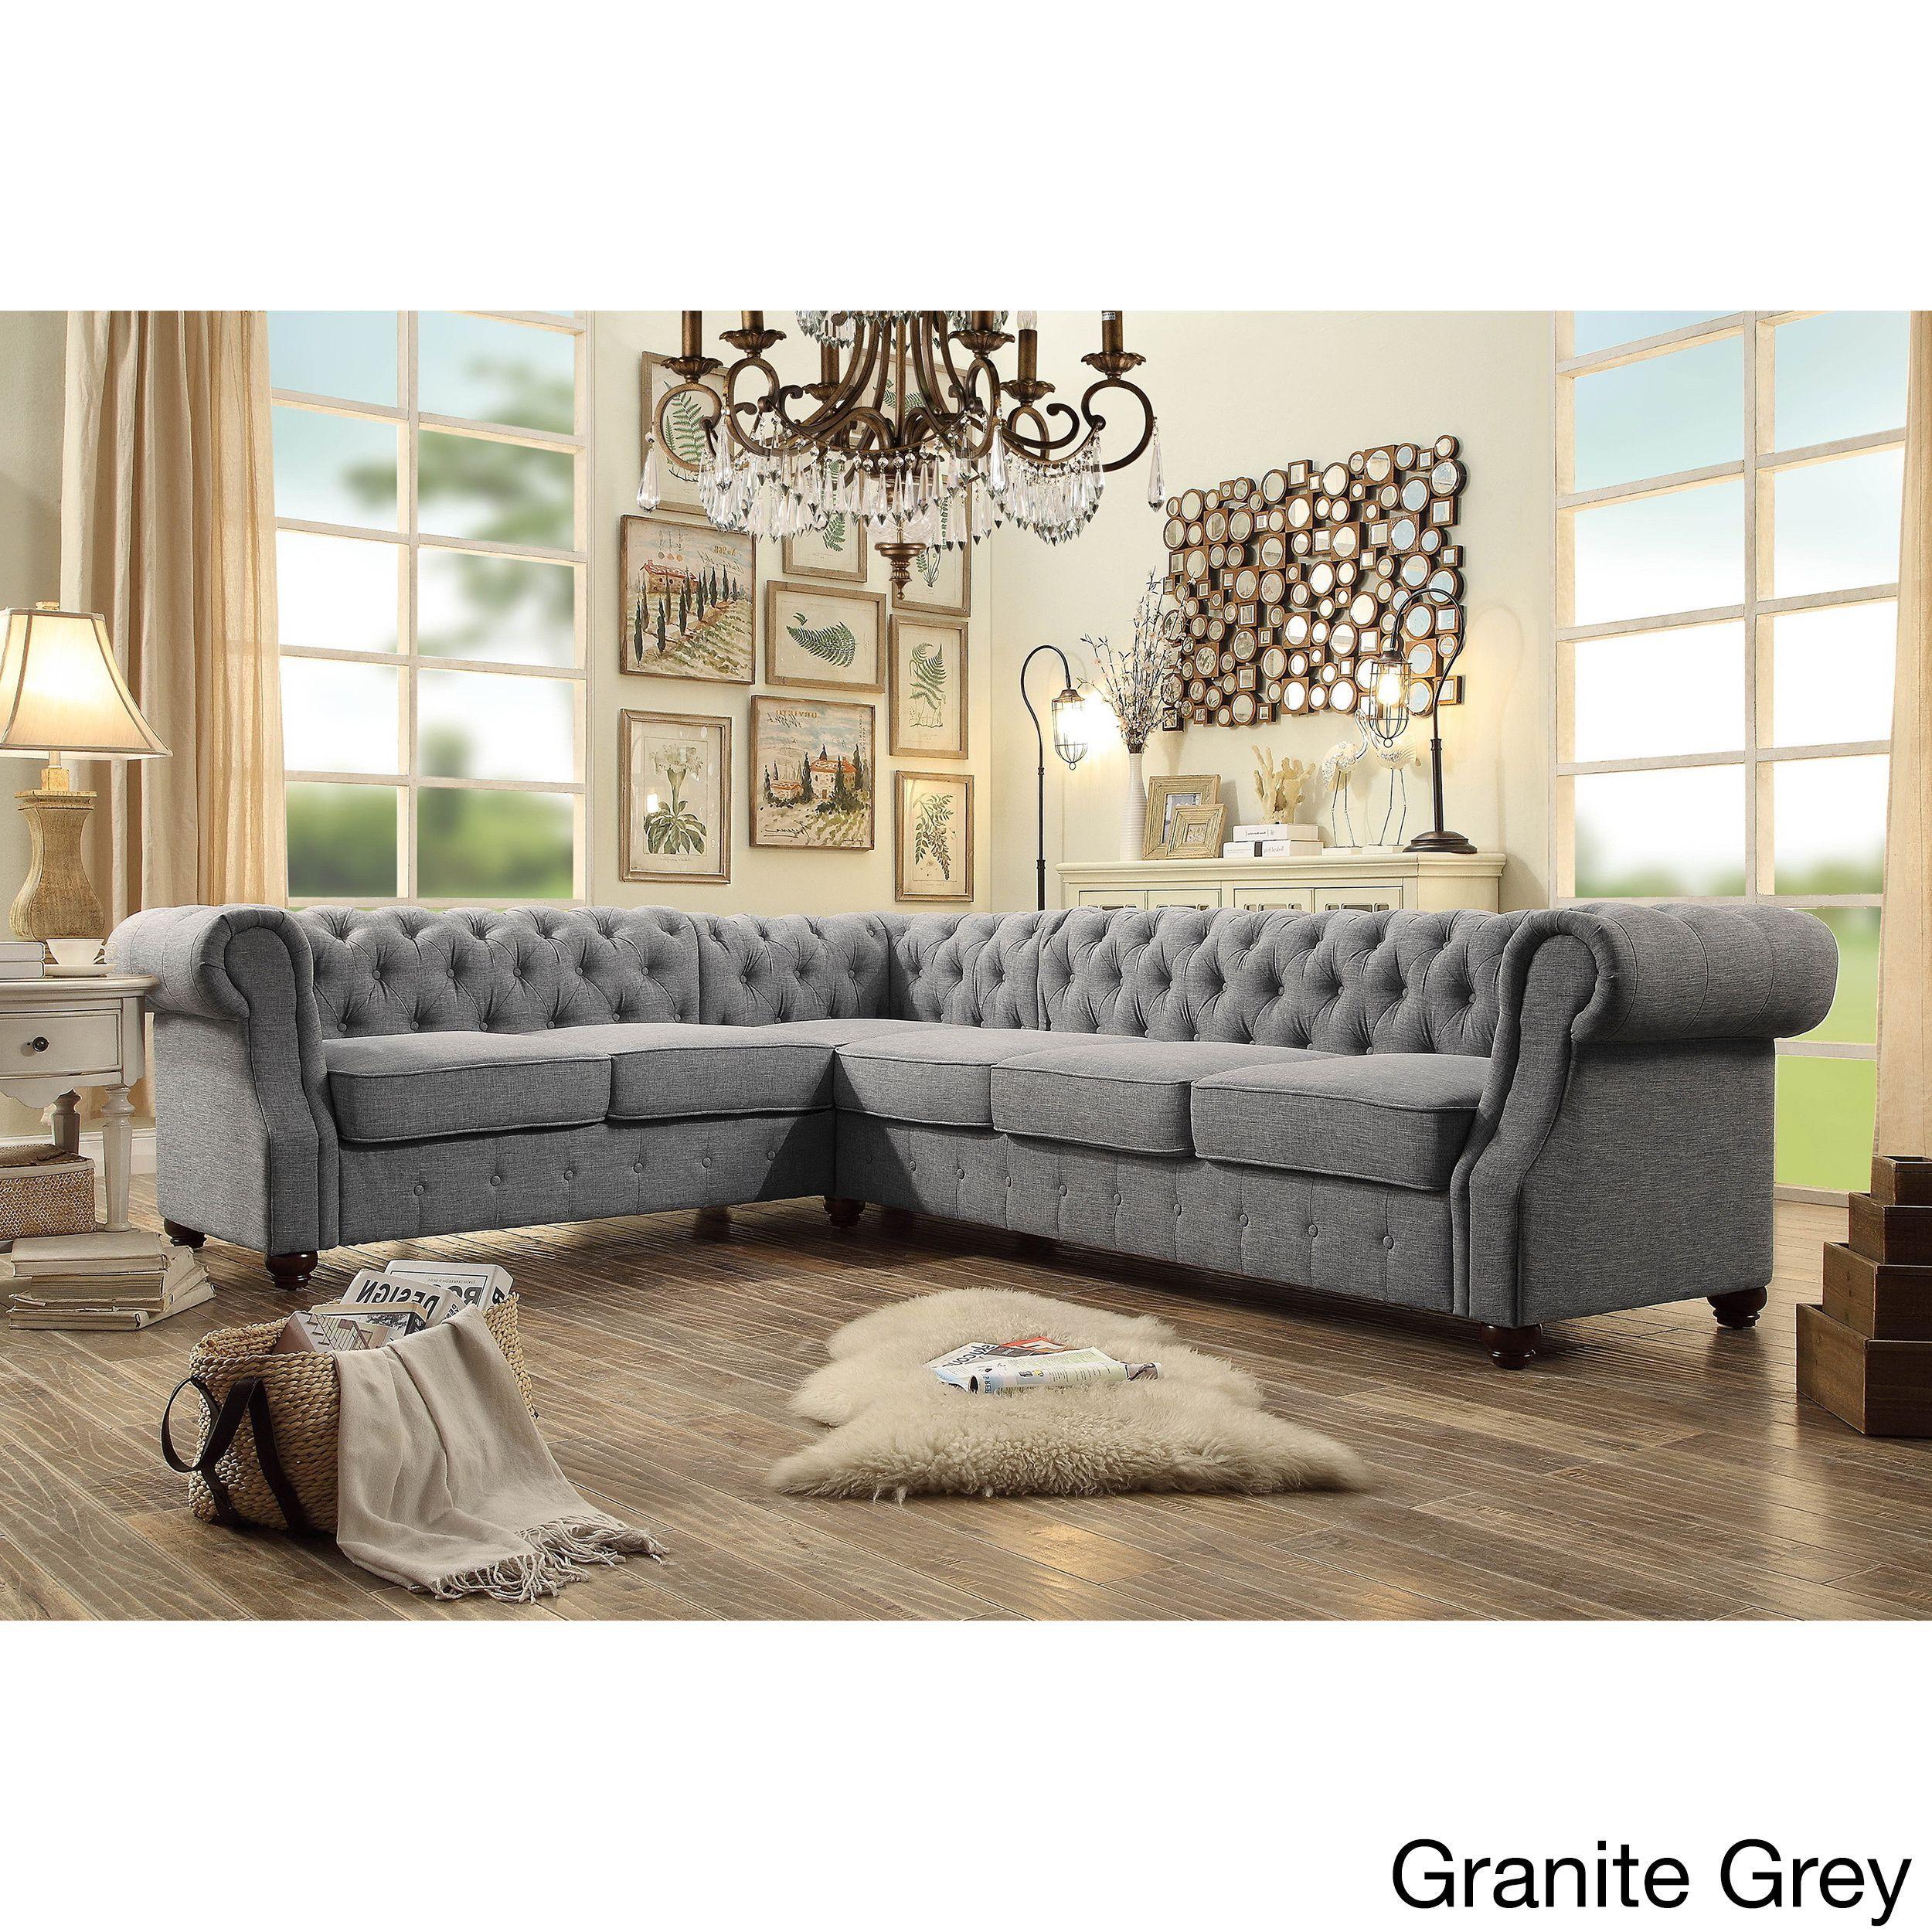 Moser Bay Furniture Olivia Tufted 6 Seat Sectional Sofa Granite Grey Linen